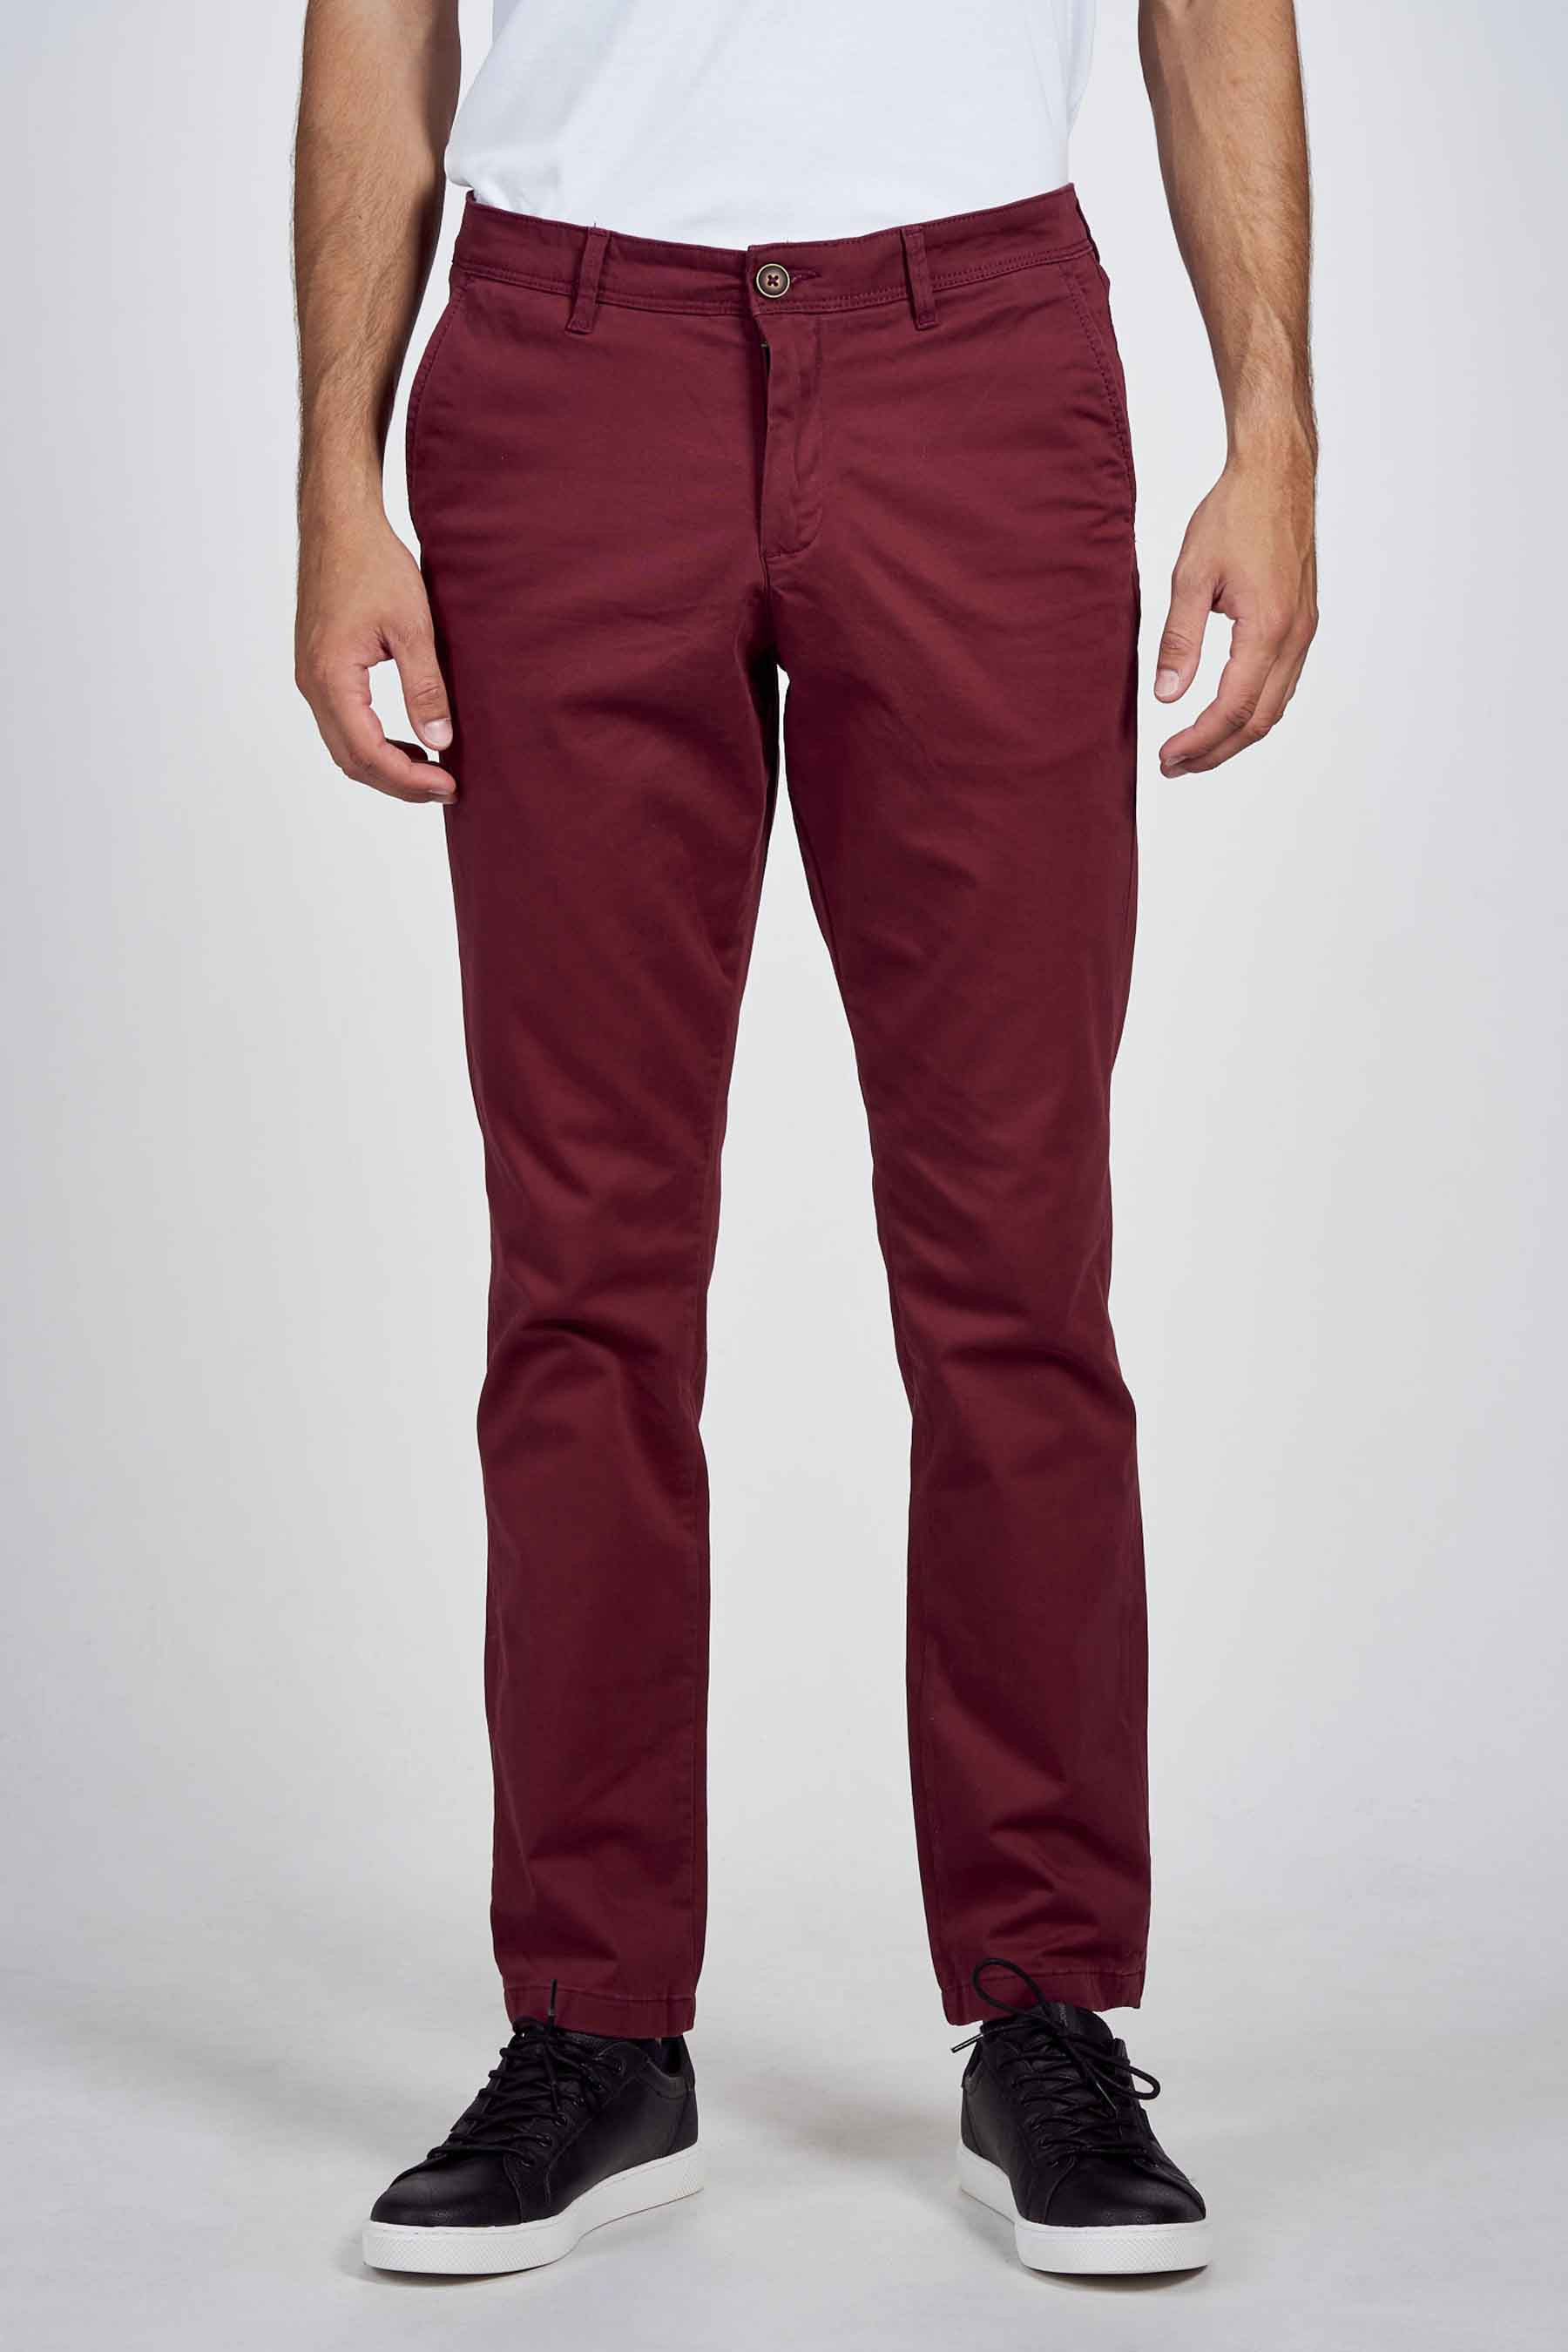 Jack & Jones Jeans Intelligenc Chino, Bruin, Heren, Maat: 27x32/28x32/28x34/29x3